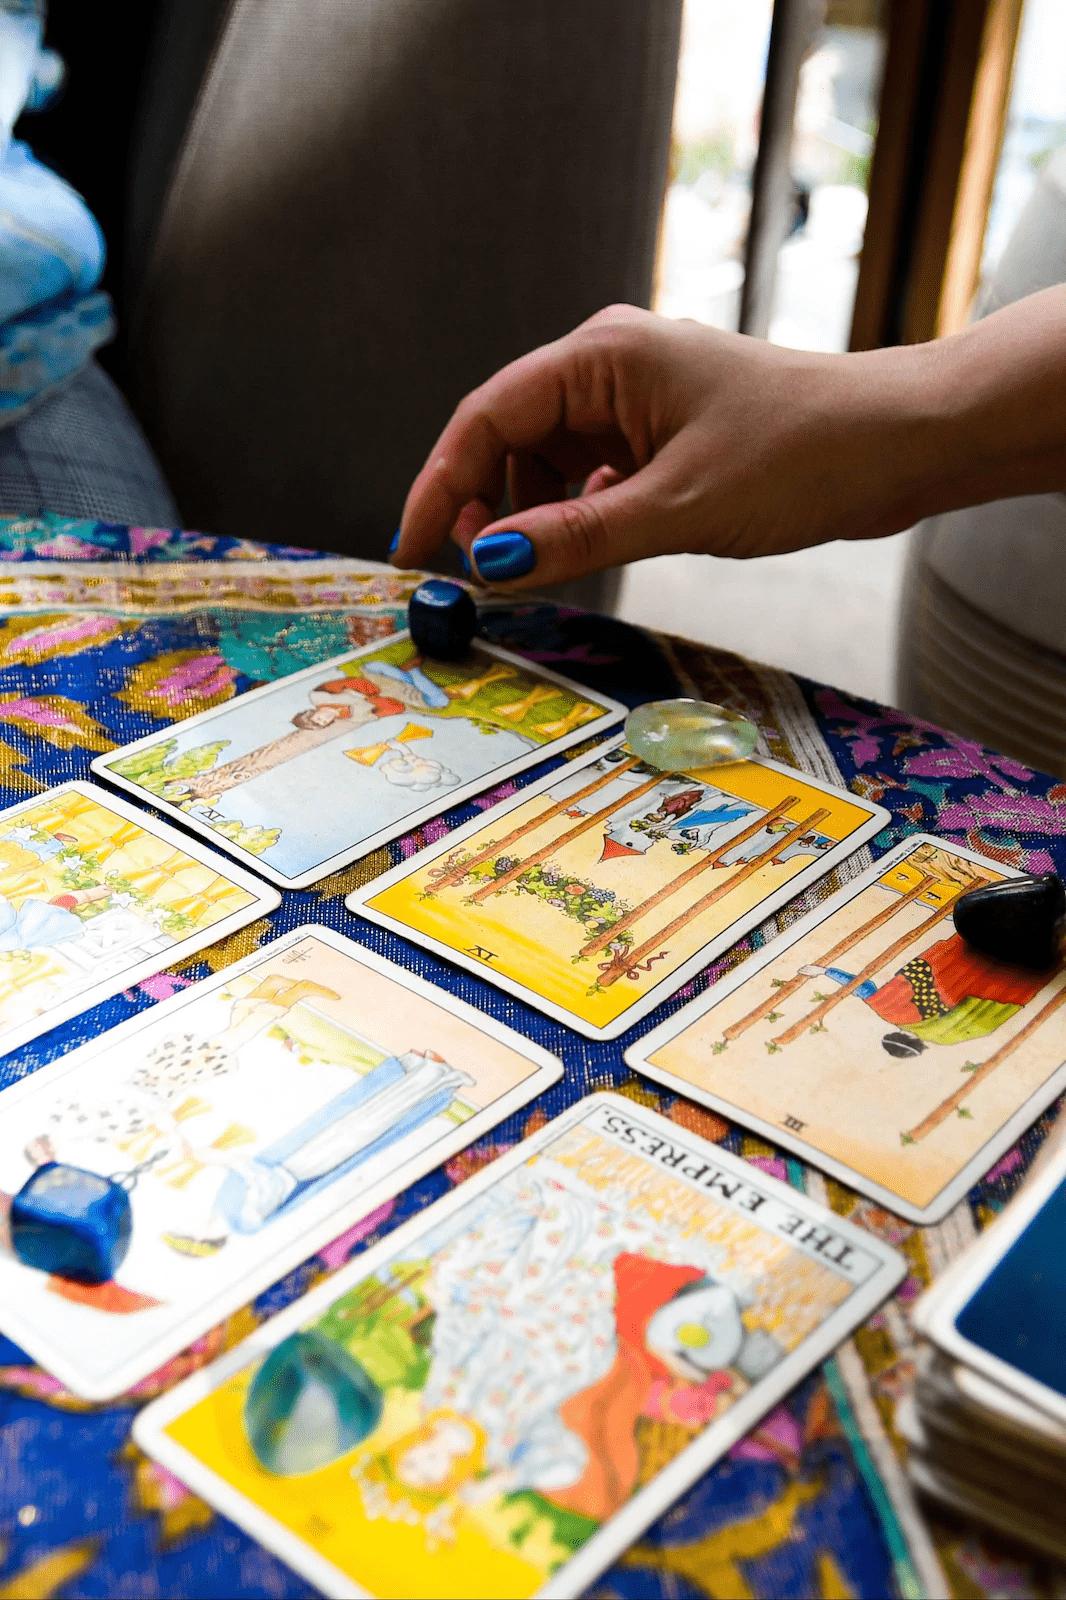 tarot reading cultural activity